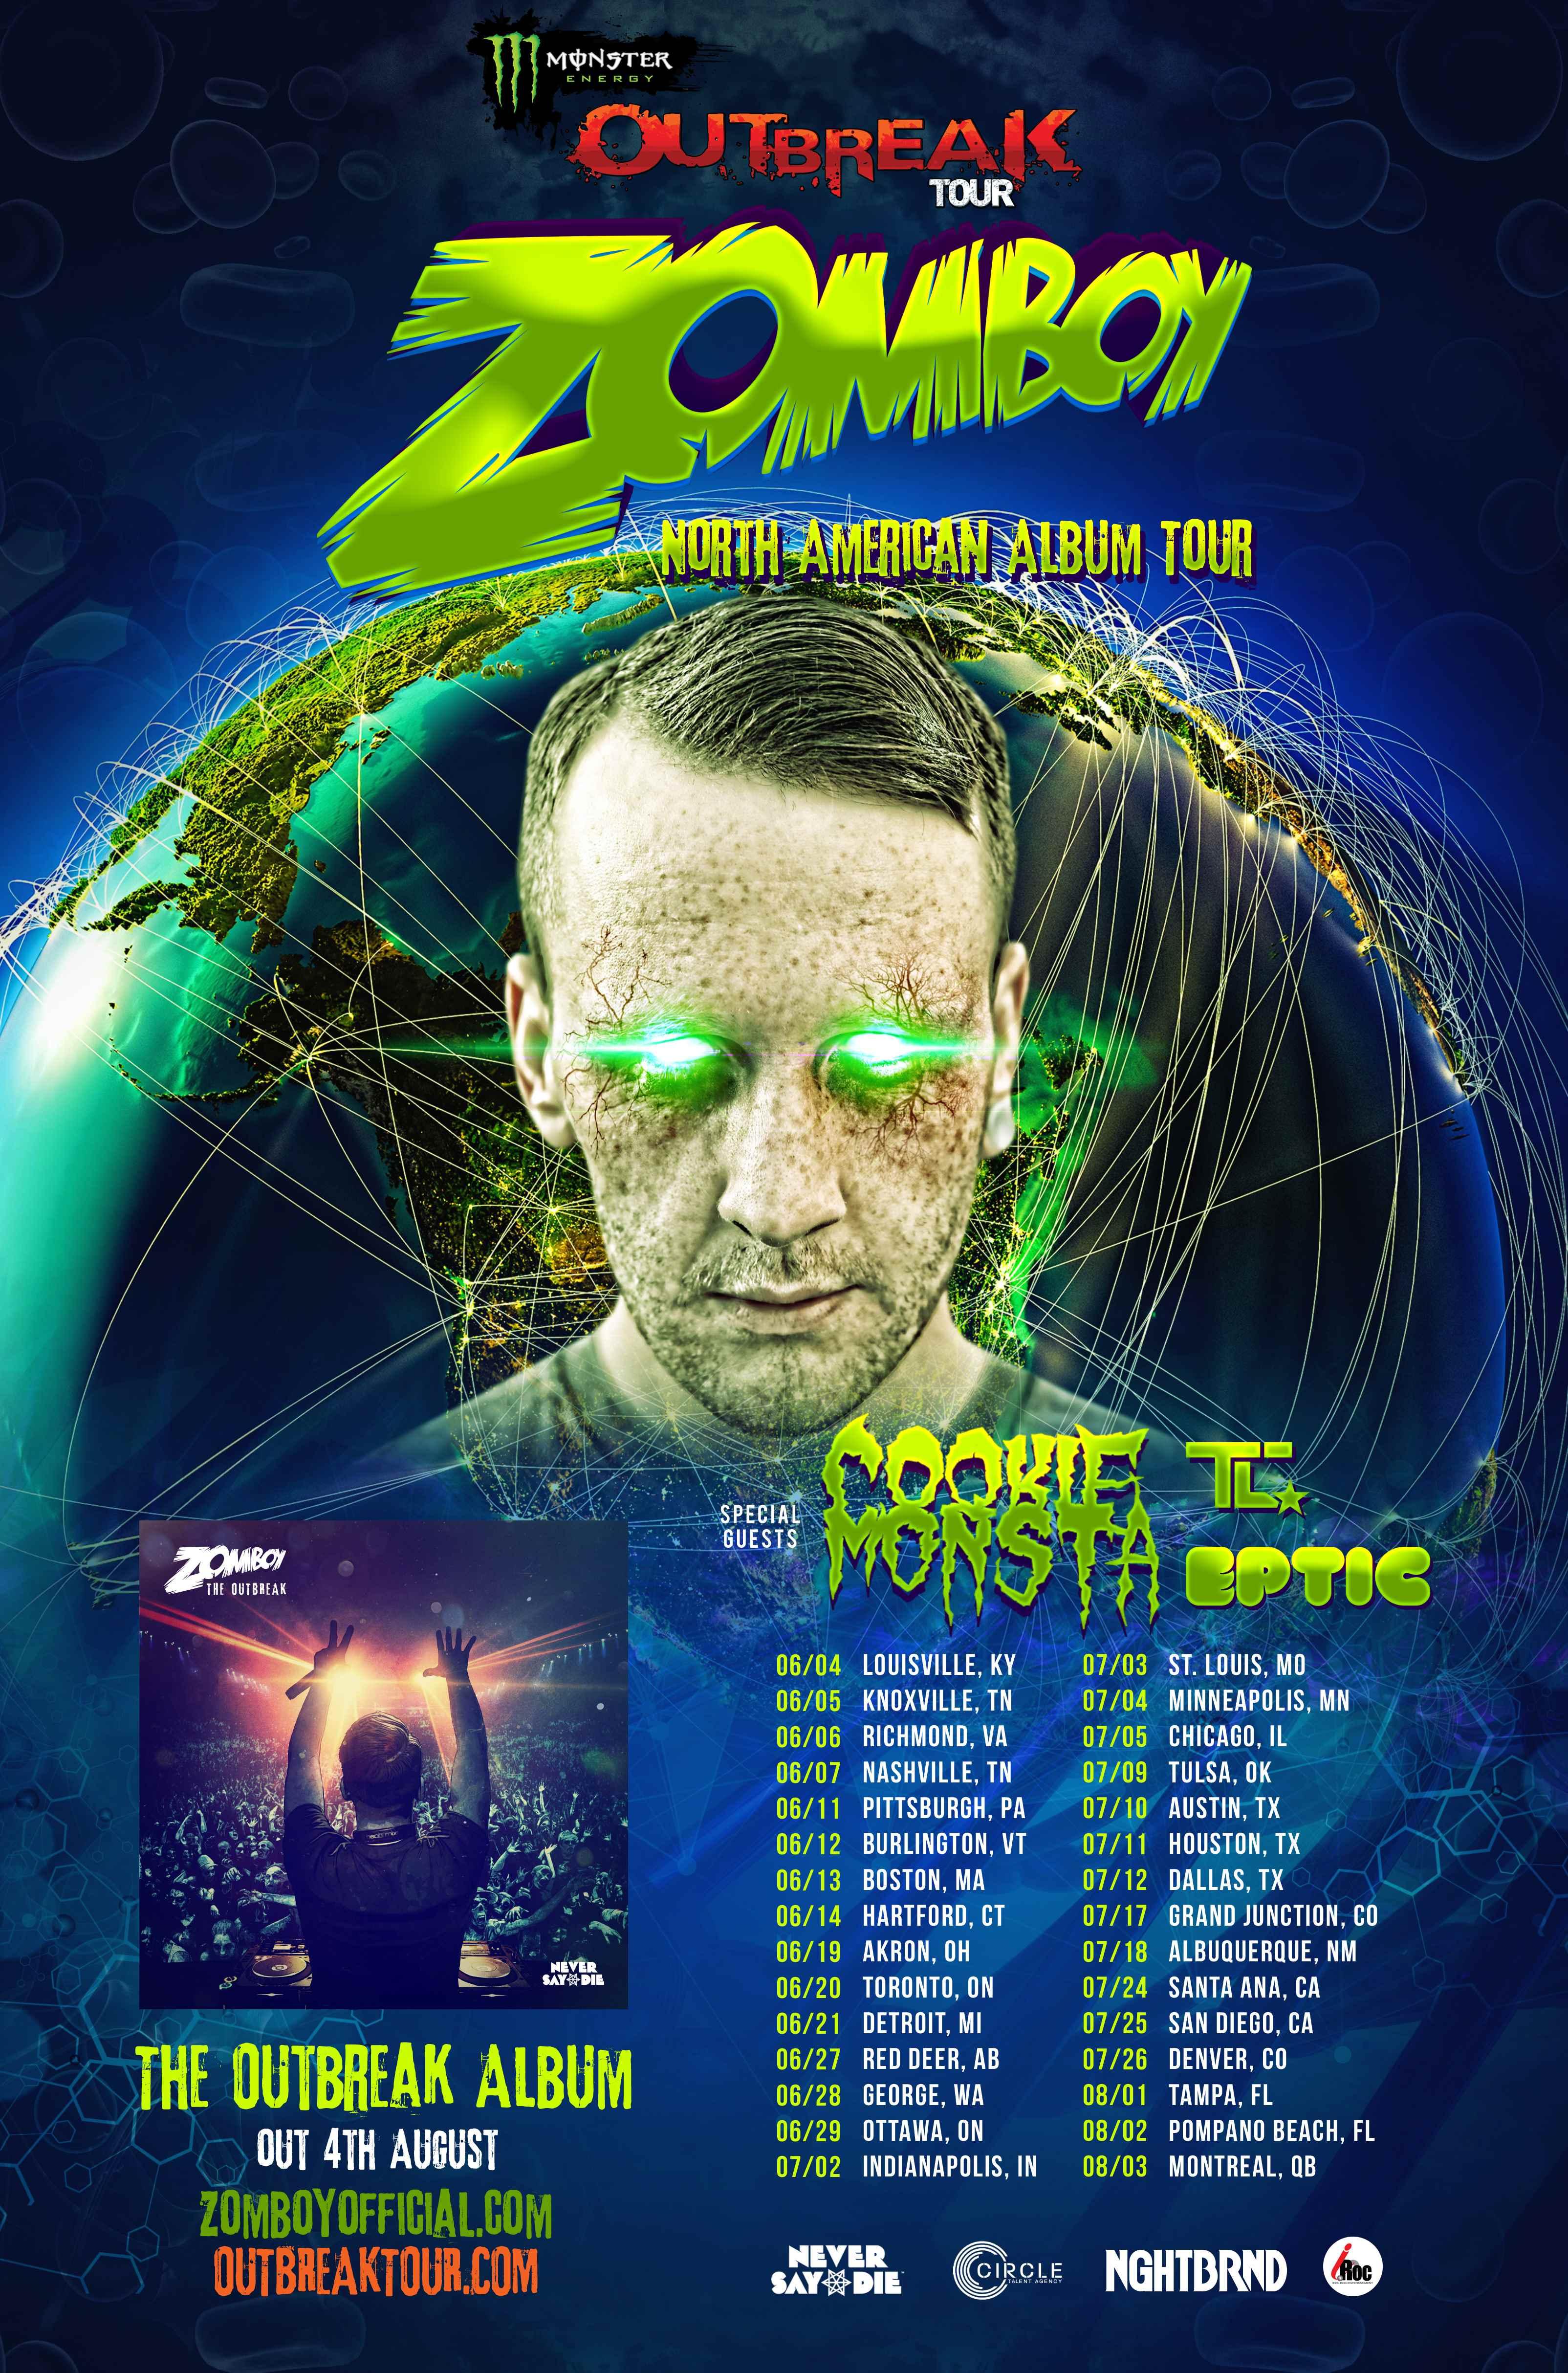 Zomboy tour dates in Melbourne